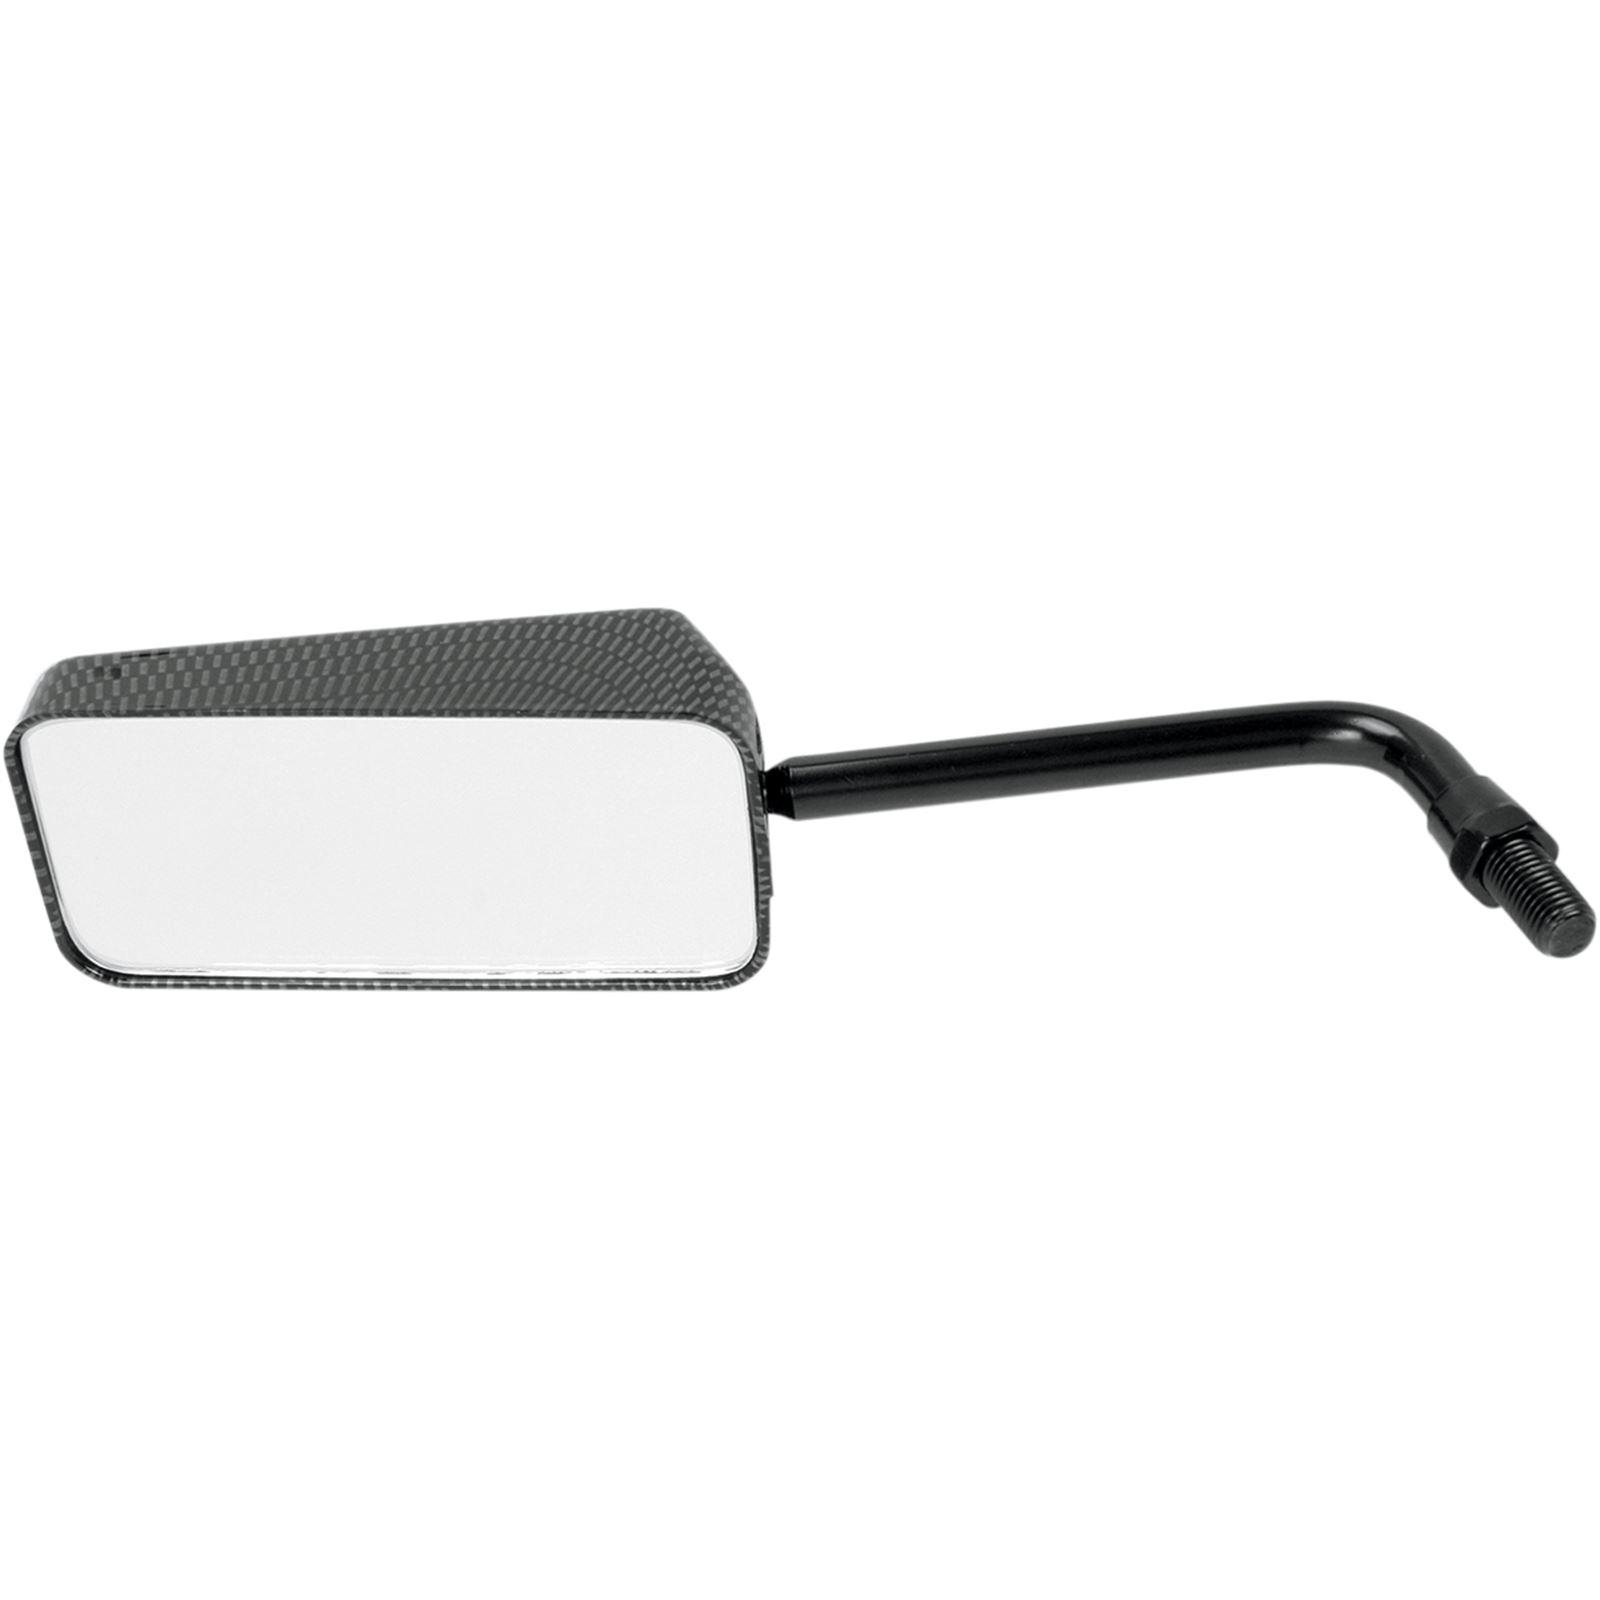 Emgo Mirror - Euro - Carbon Fiber - 10 mm